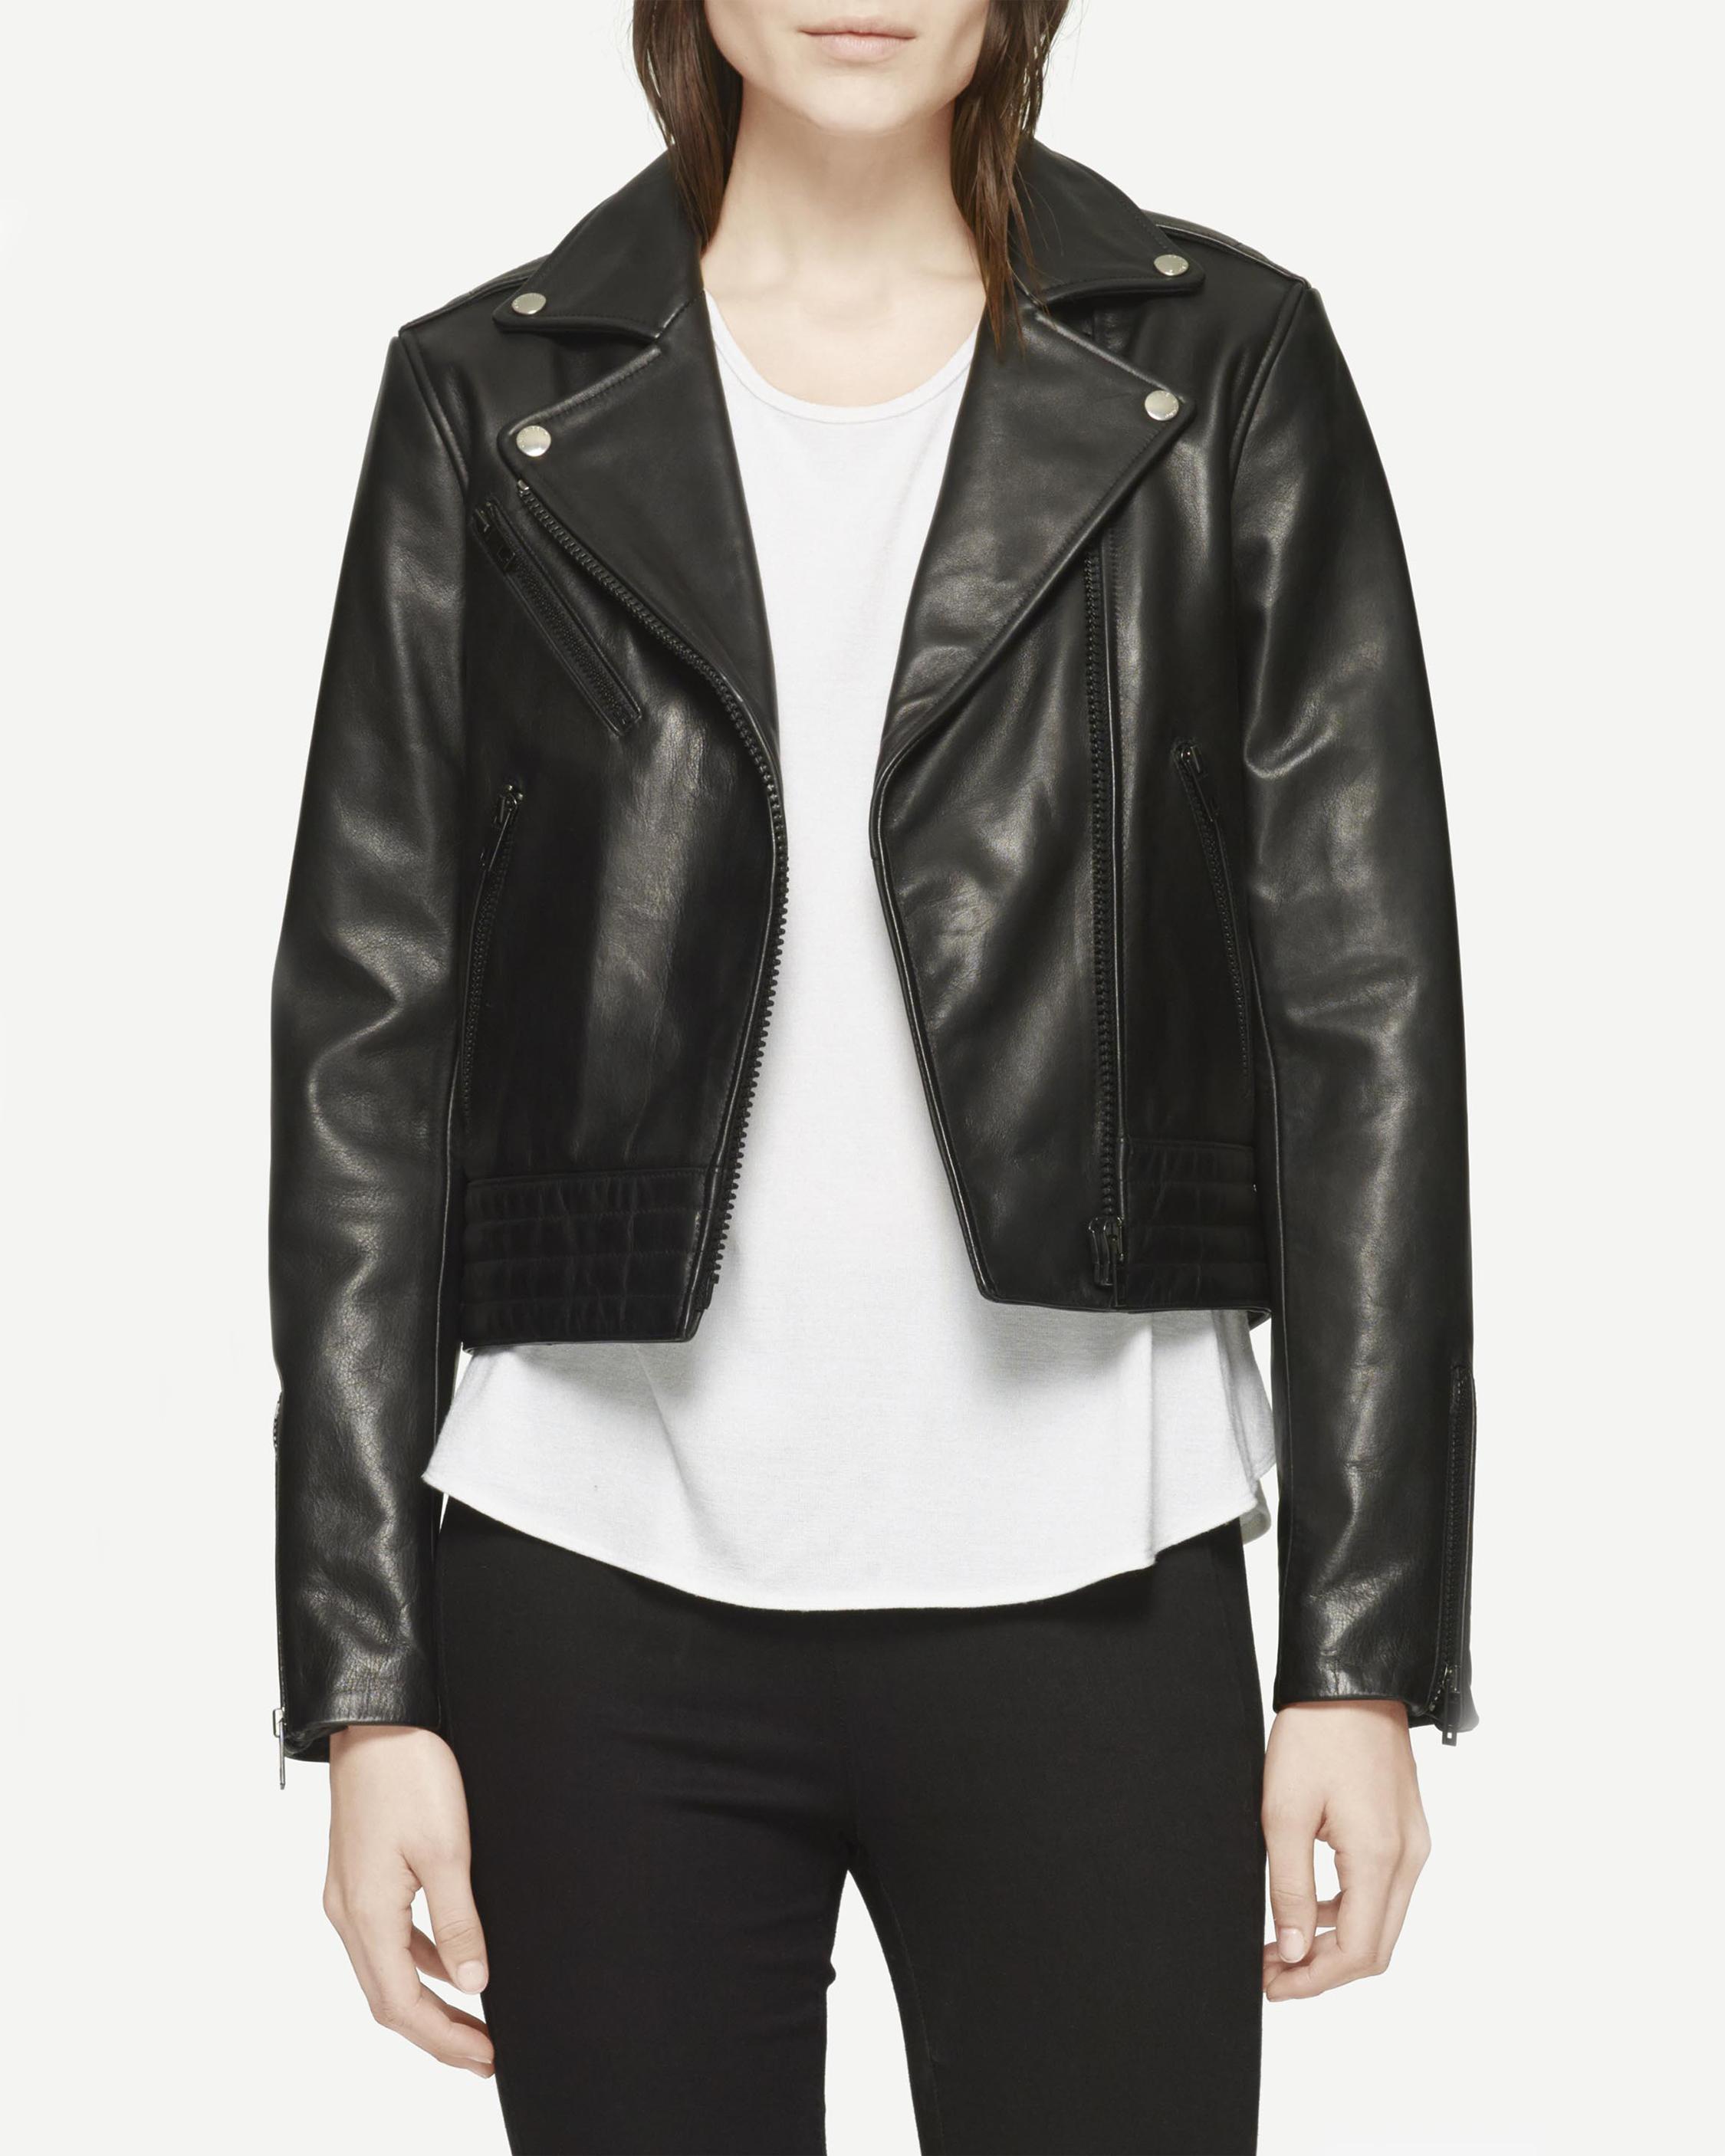 9809892fc Chrystie Jacket | Apparel Coats & Jackets | rag & bone